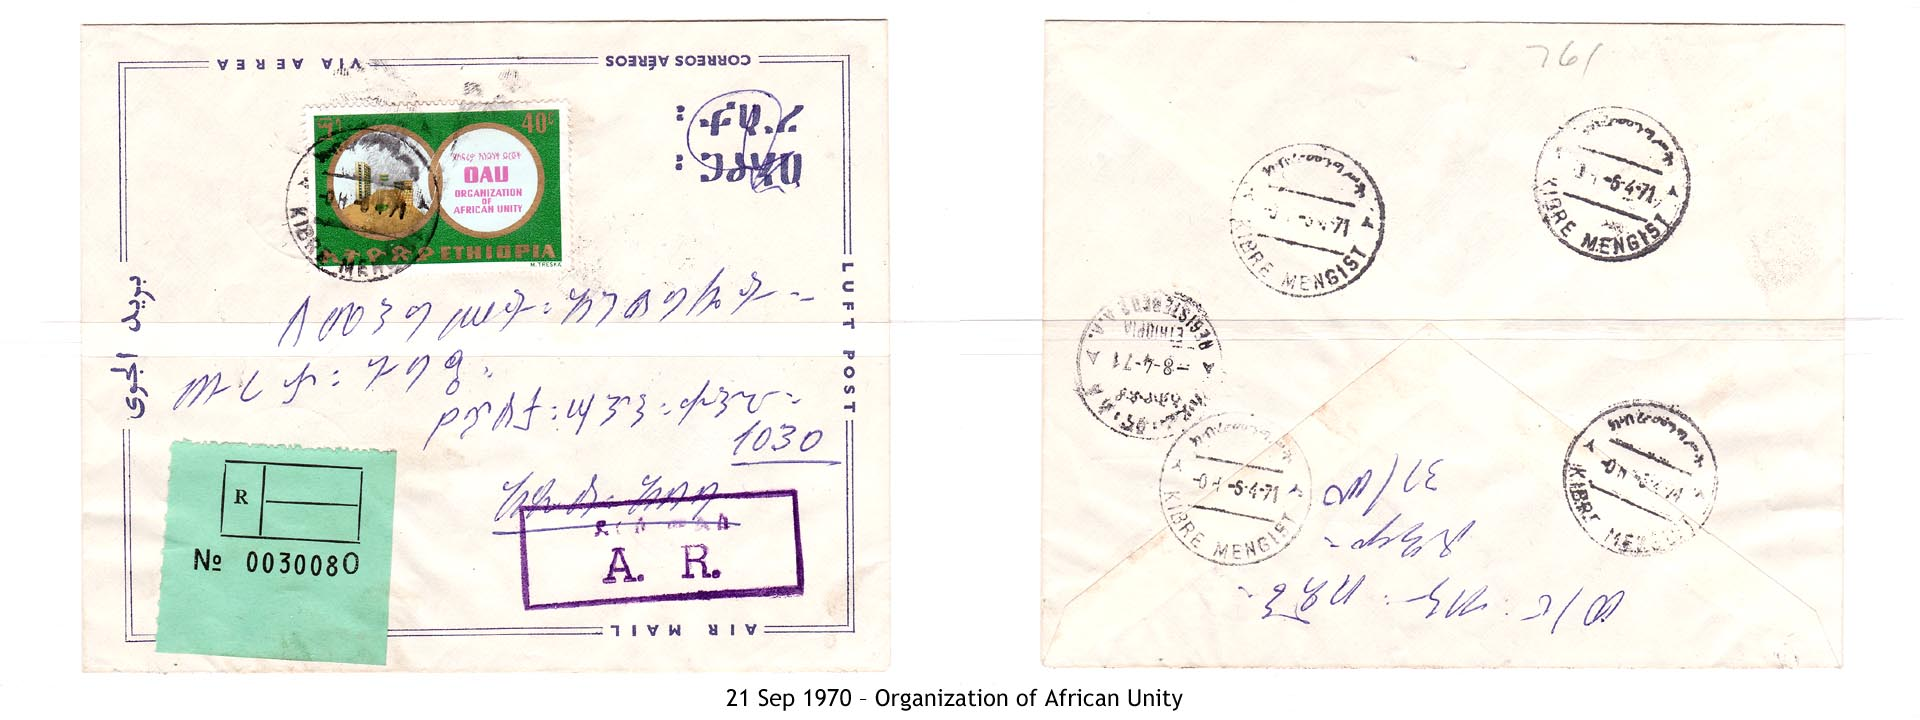 19700921 – Organization of African Unity